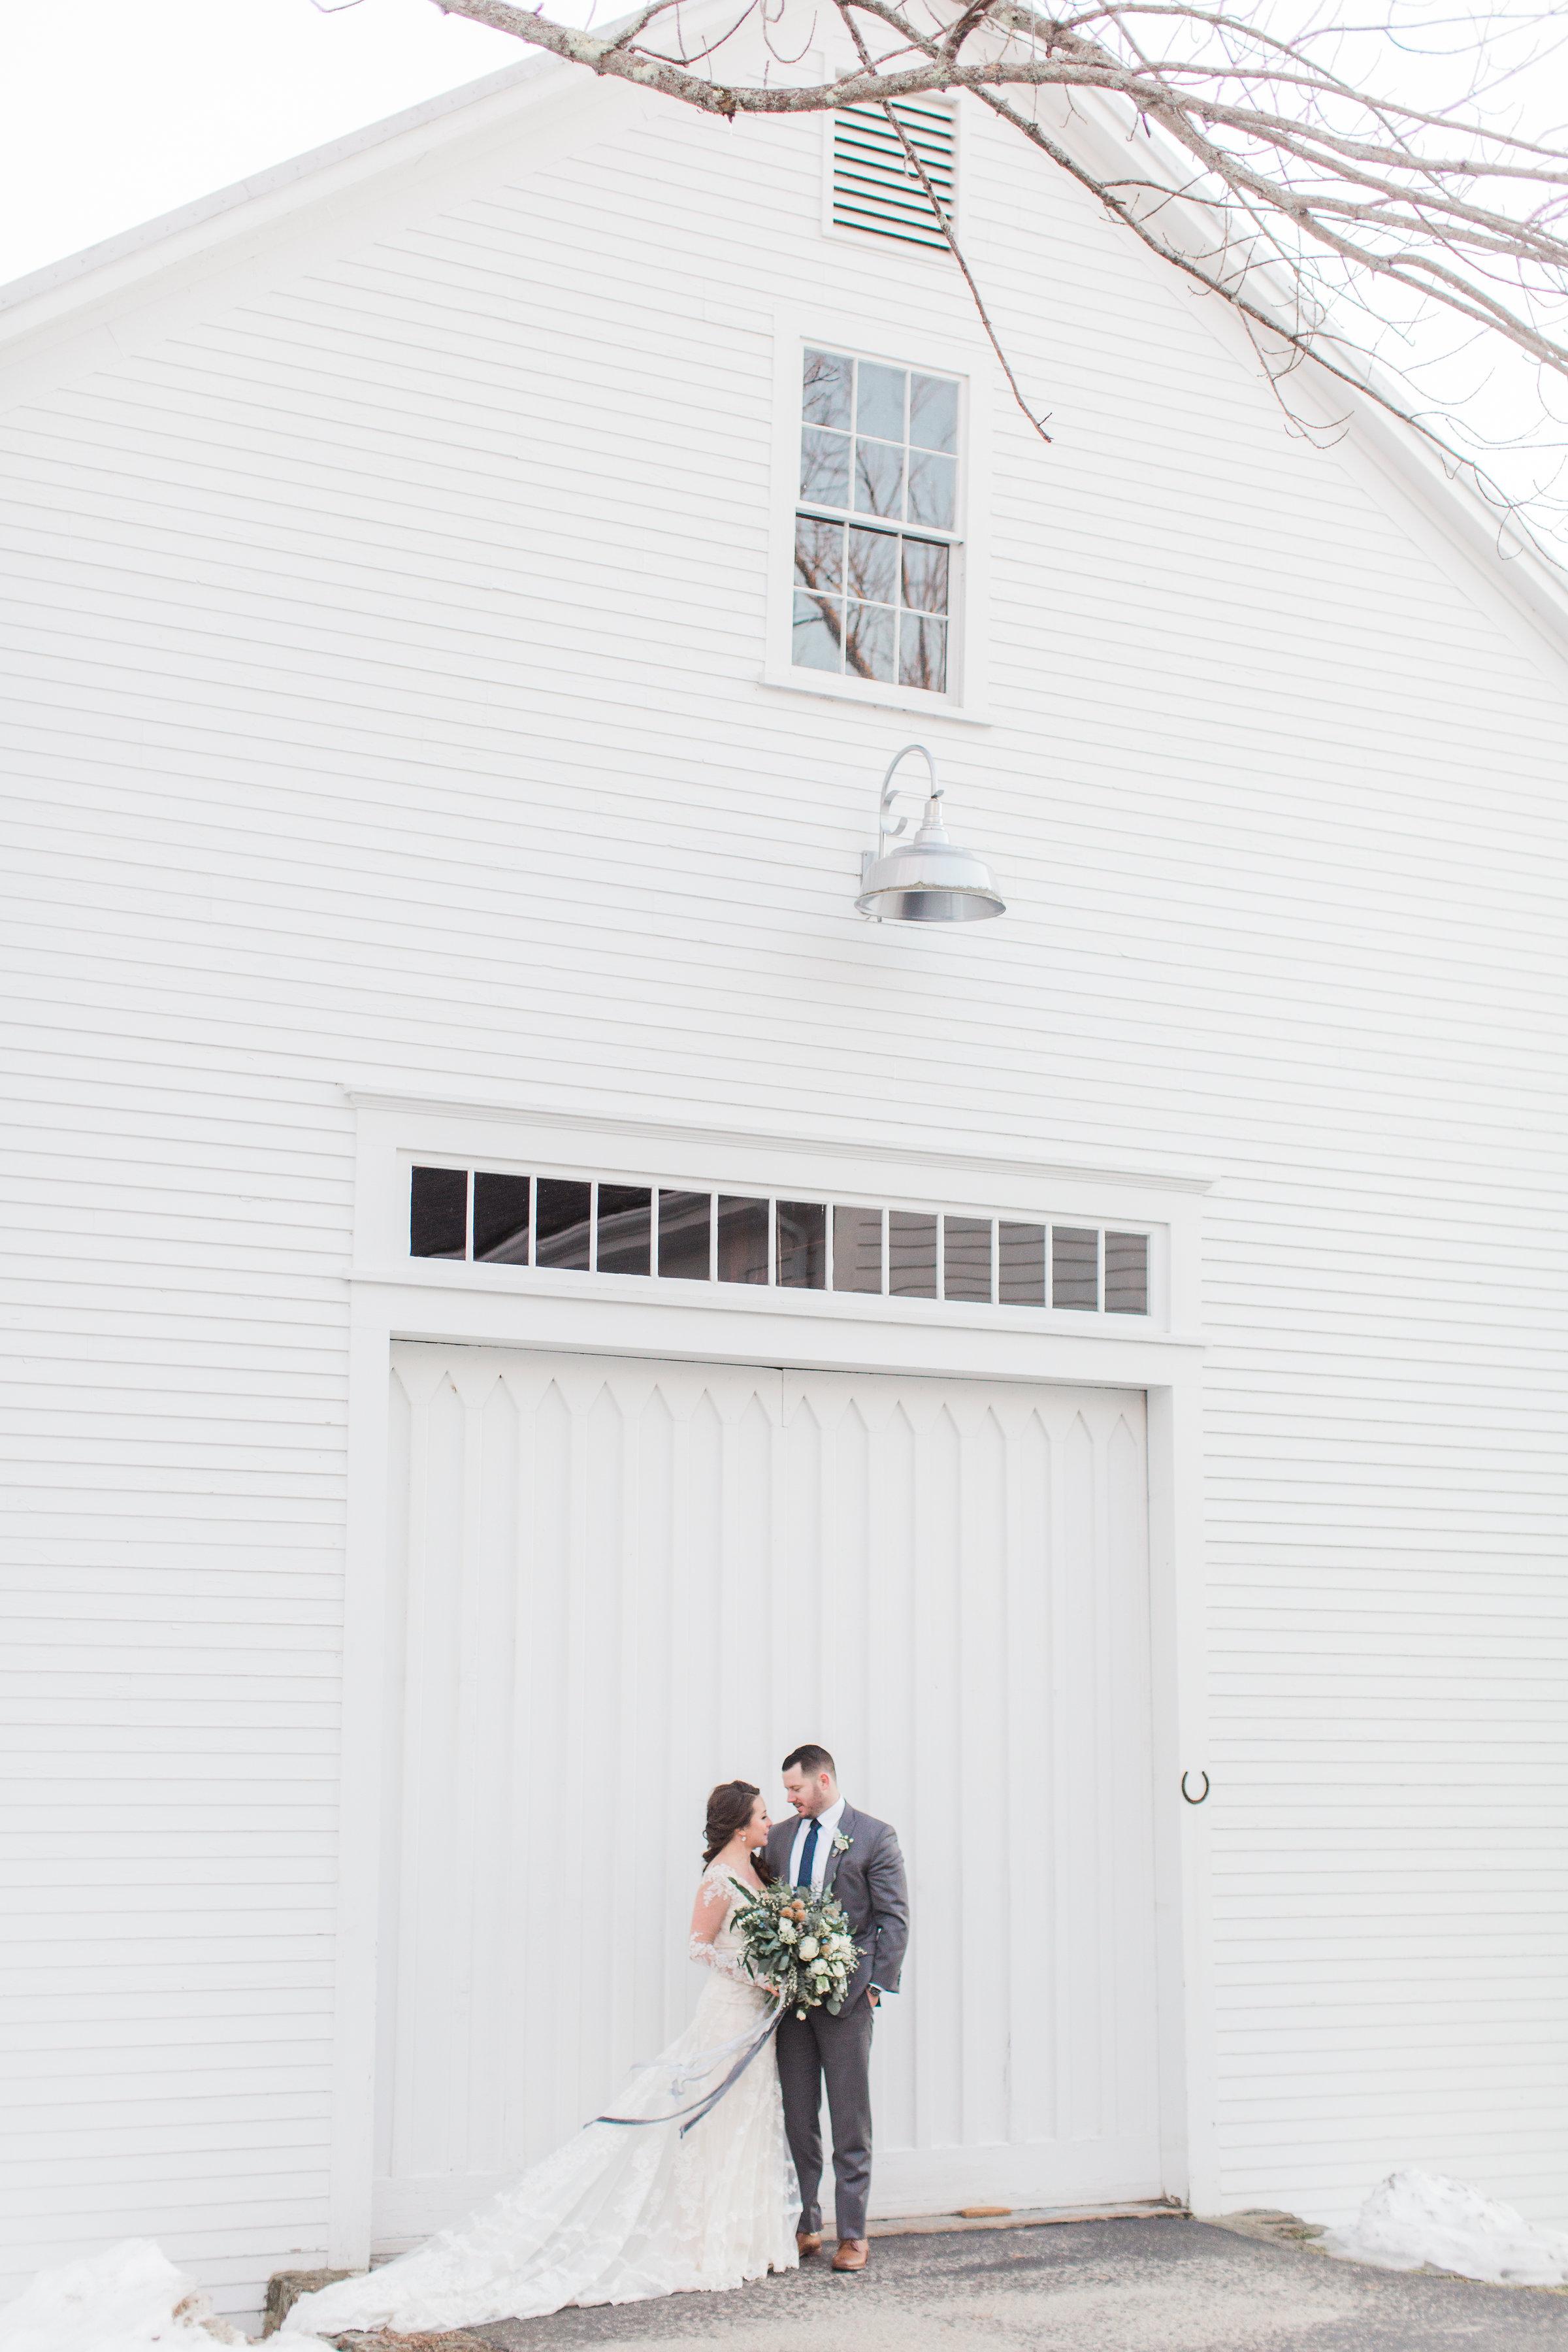 Cunningham_Farm_Winter_Styled_Wedding_Shoot_Meredith_Jane_Photography-241.jpg